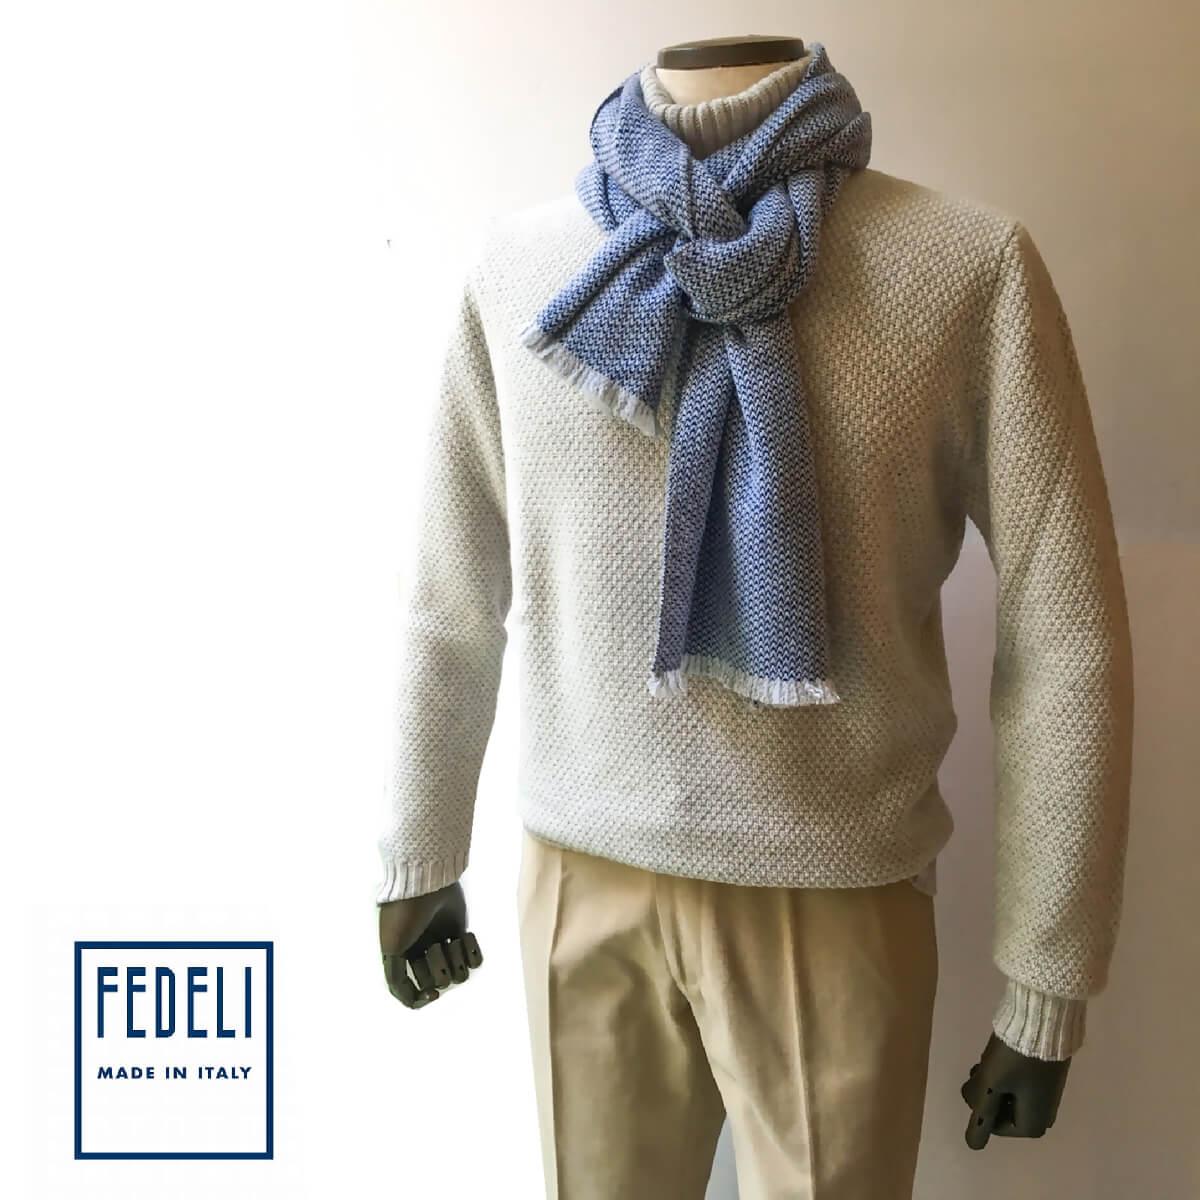 FEDELI (フェデーリ) カシミヤマフラー ブルー メンズ レディース おしゃれ ブランド ニット